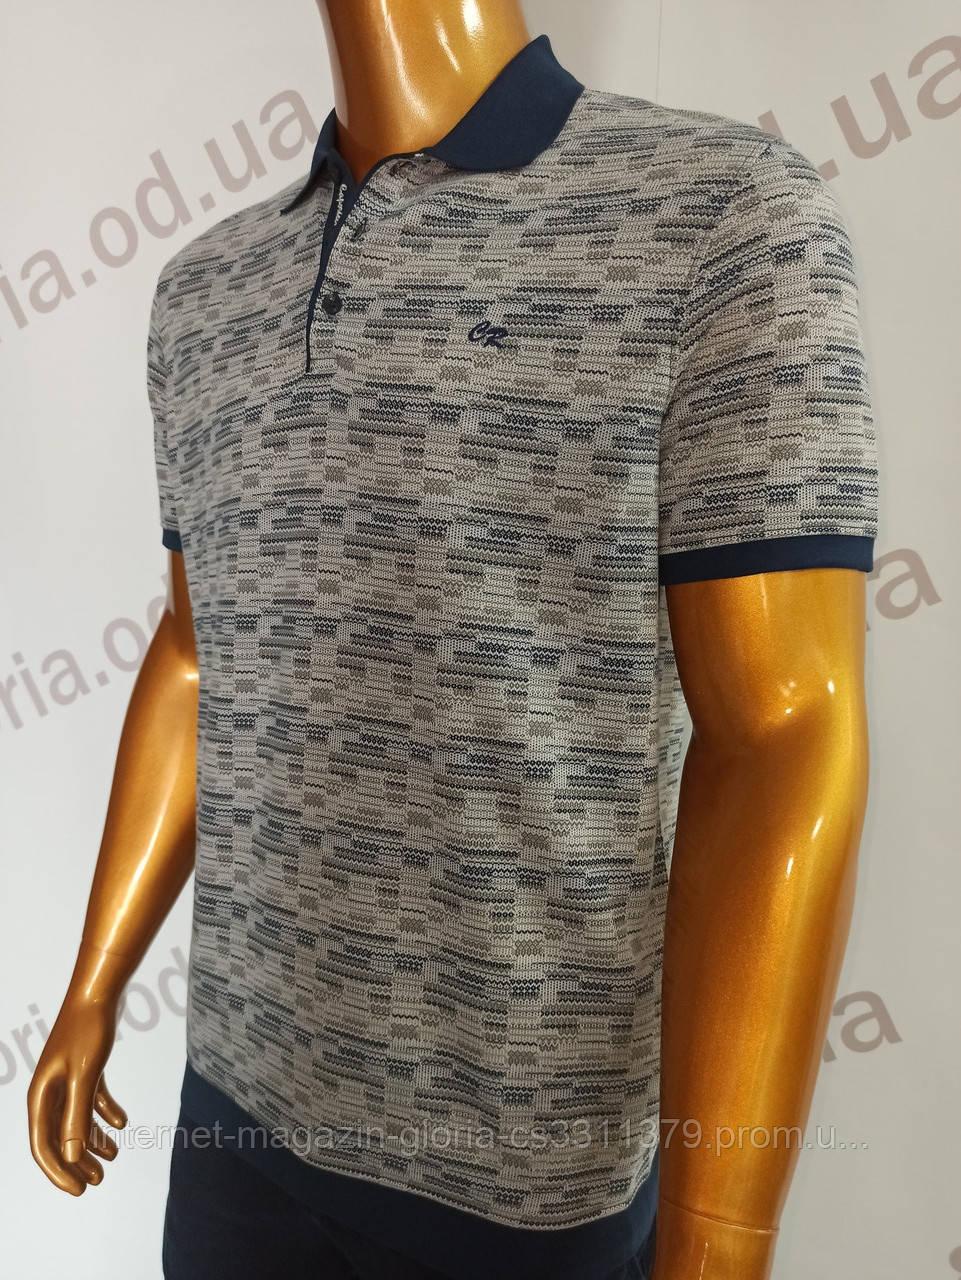 Мужская футболка поло Caporicco. PSL-8831. Размеры: M,L,XL,XXL.